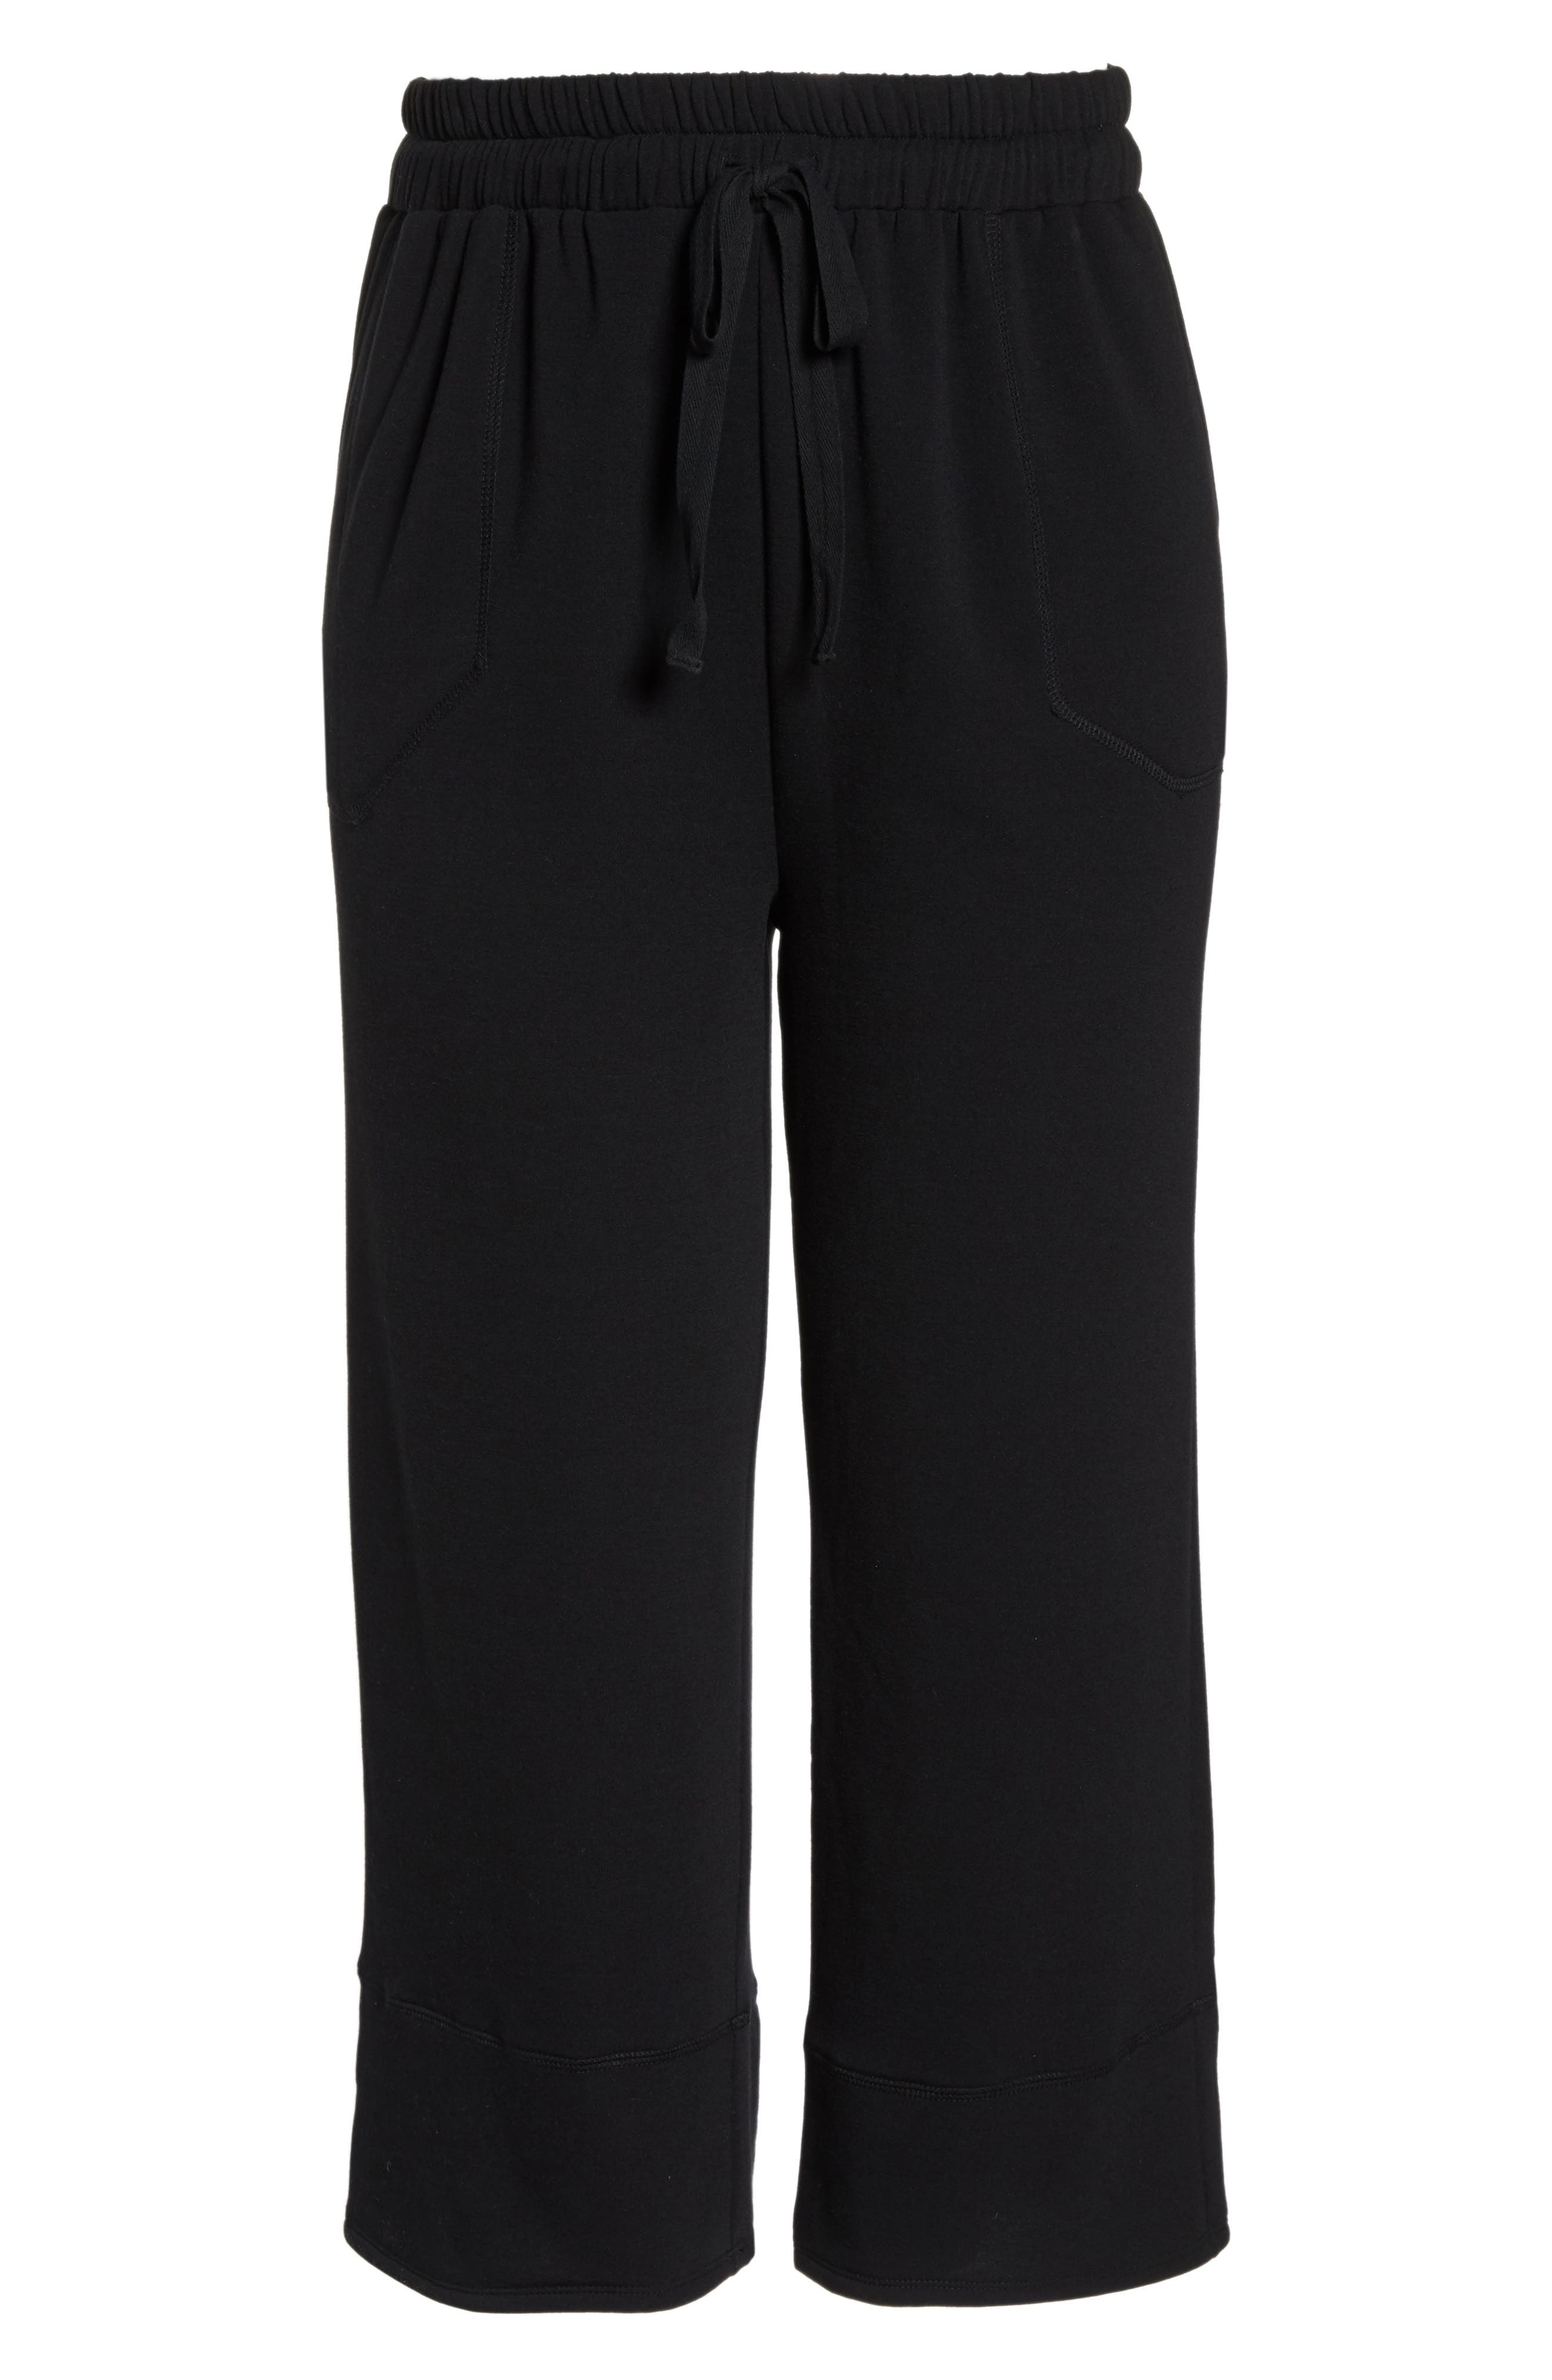 Off Duty Easy Drawstring Pants,                             Alternate thumbnail 7, color,                             Black